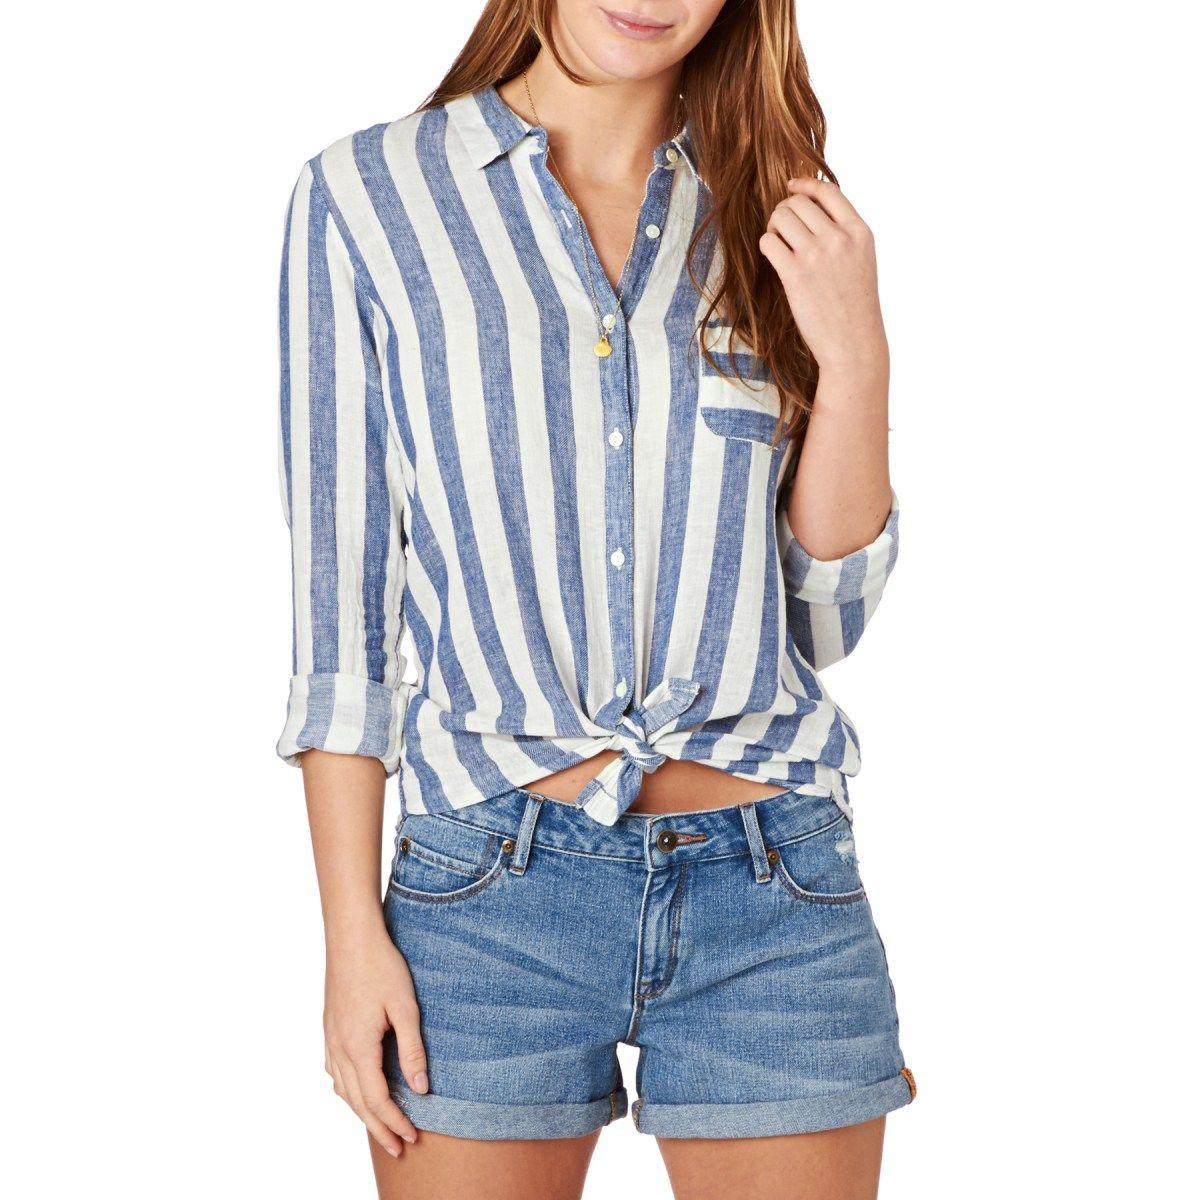 4377496f Women's Maison Scotch Shirts - Maison Scotch Striped Linen Beach Shirt - Blue  Stripe